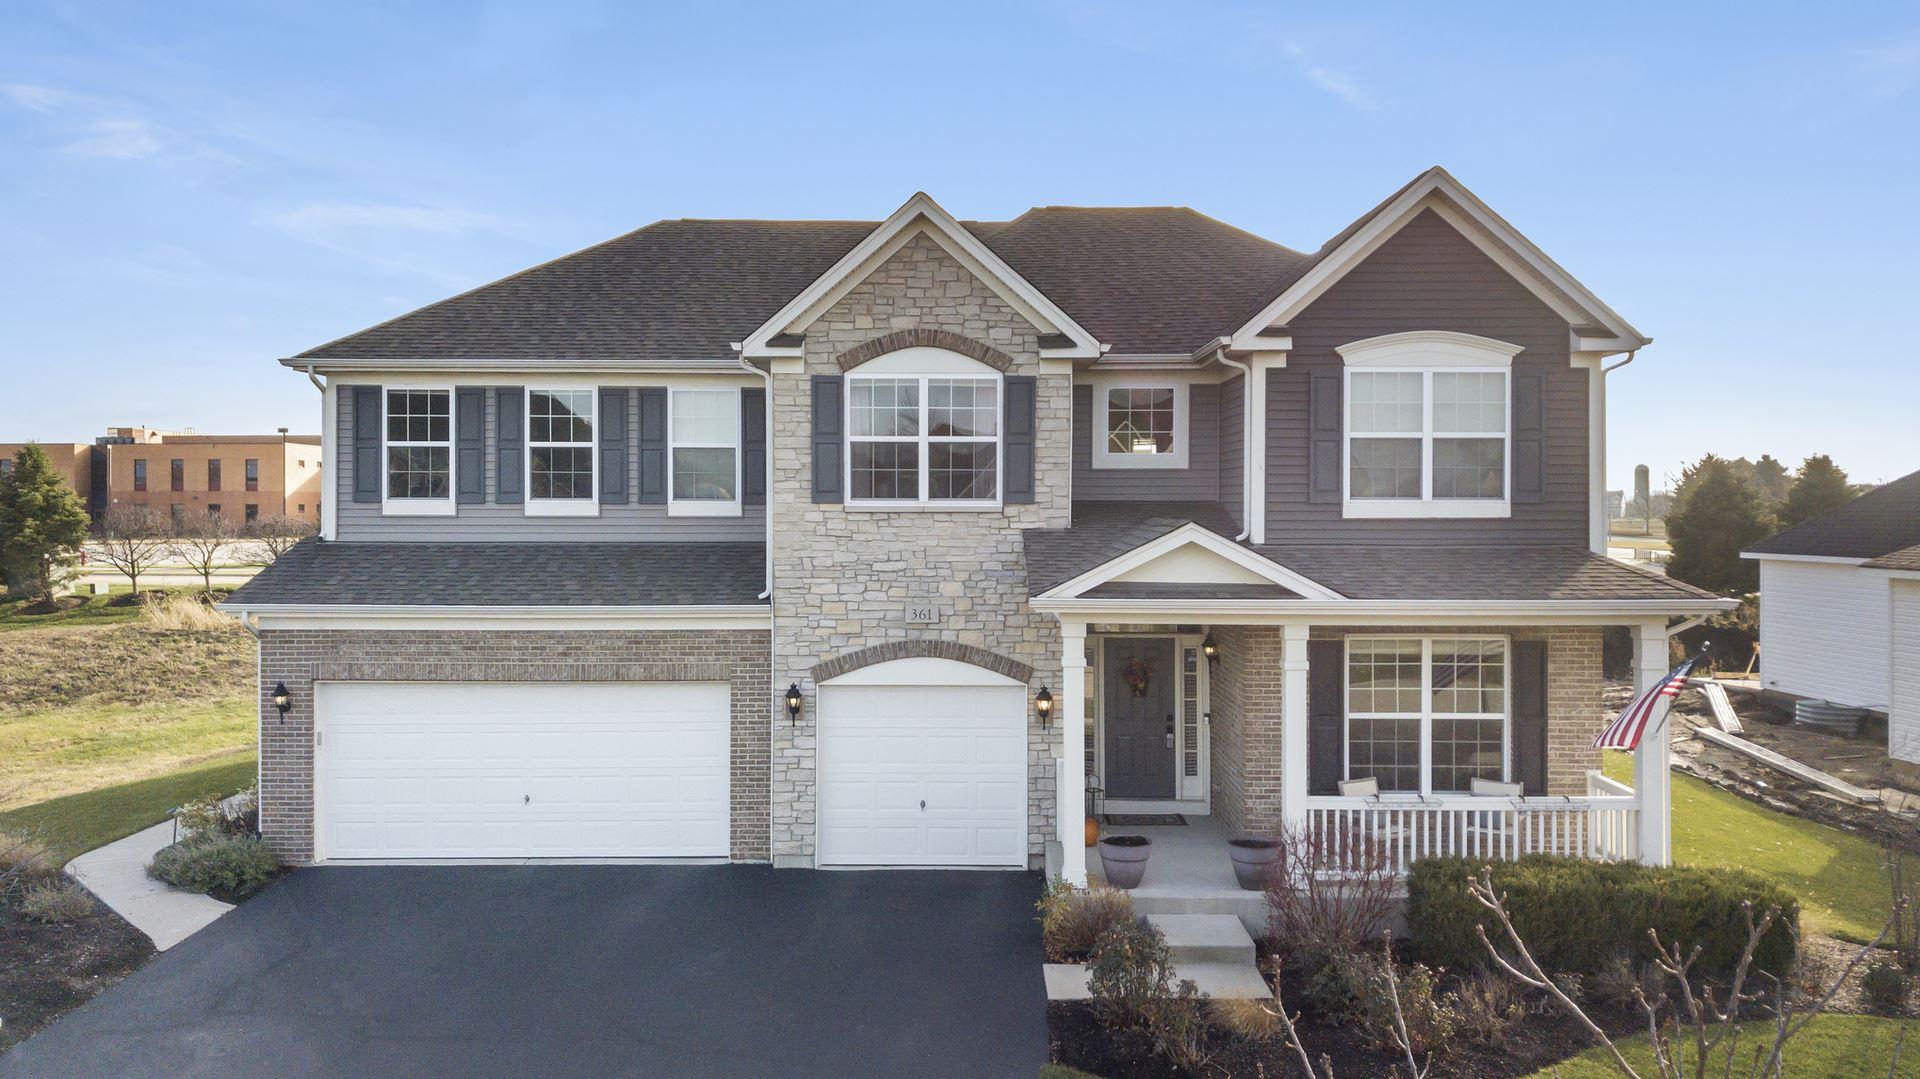 Photo of 361 Bloomfield Circle E, Oswego, IL 60543 (MLS # 10942612)